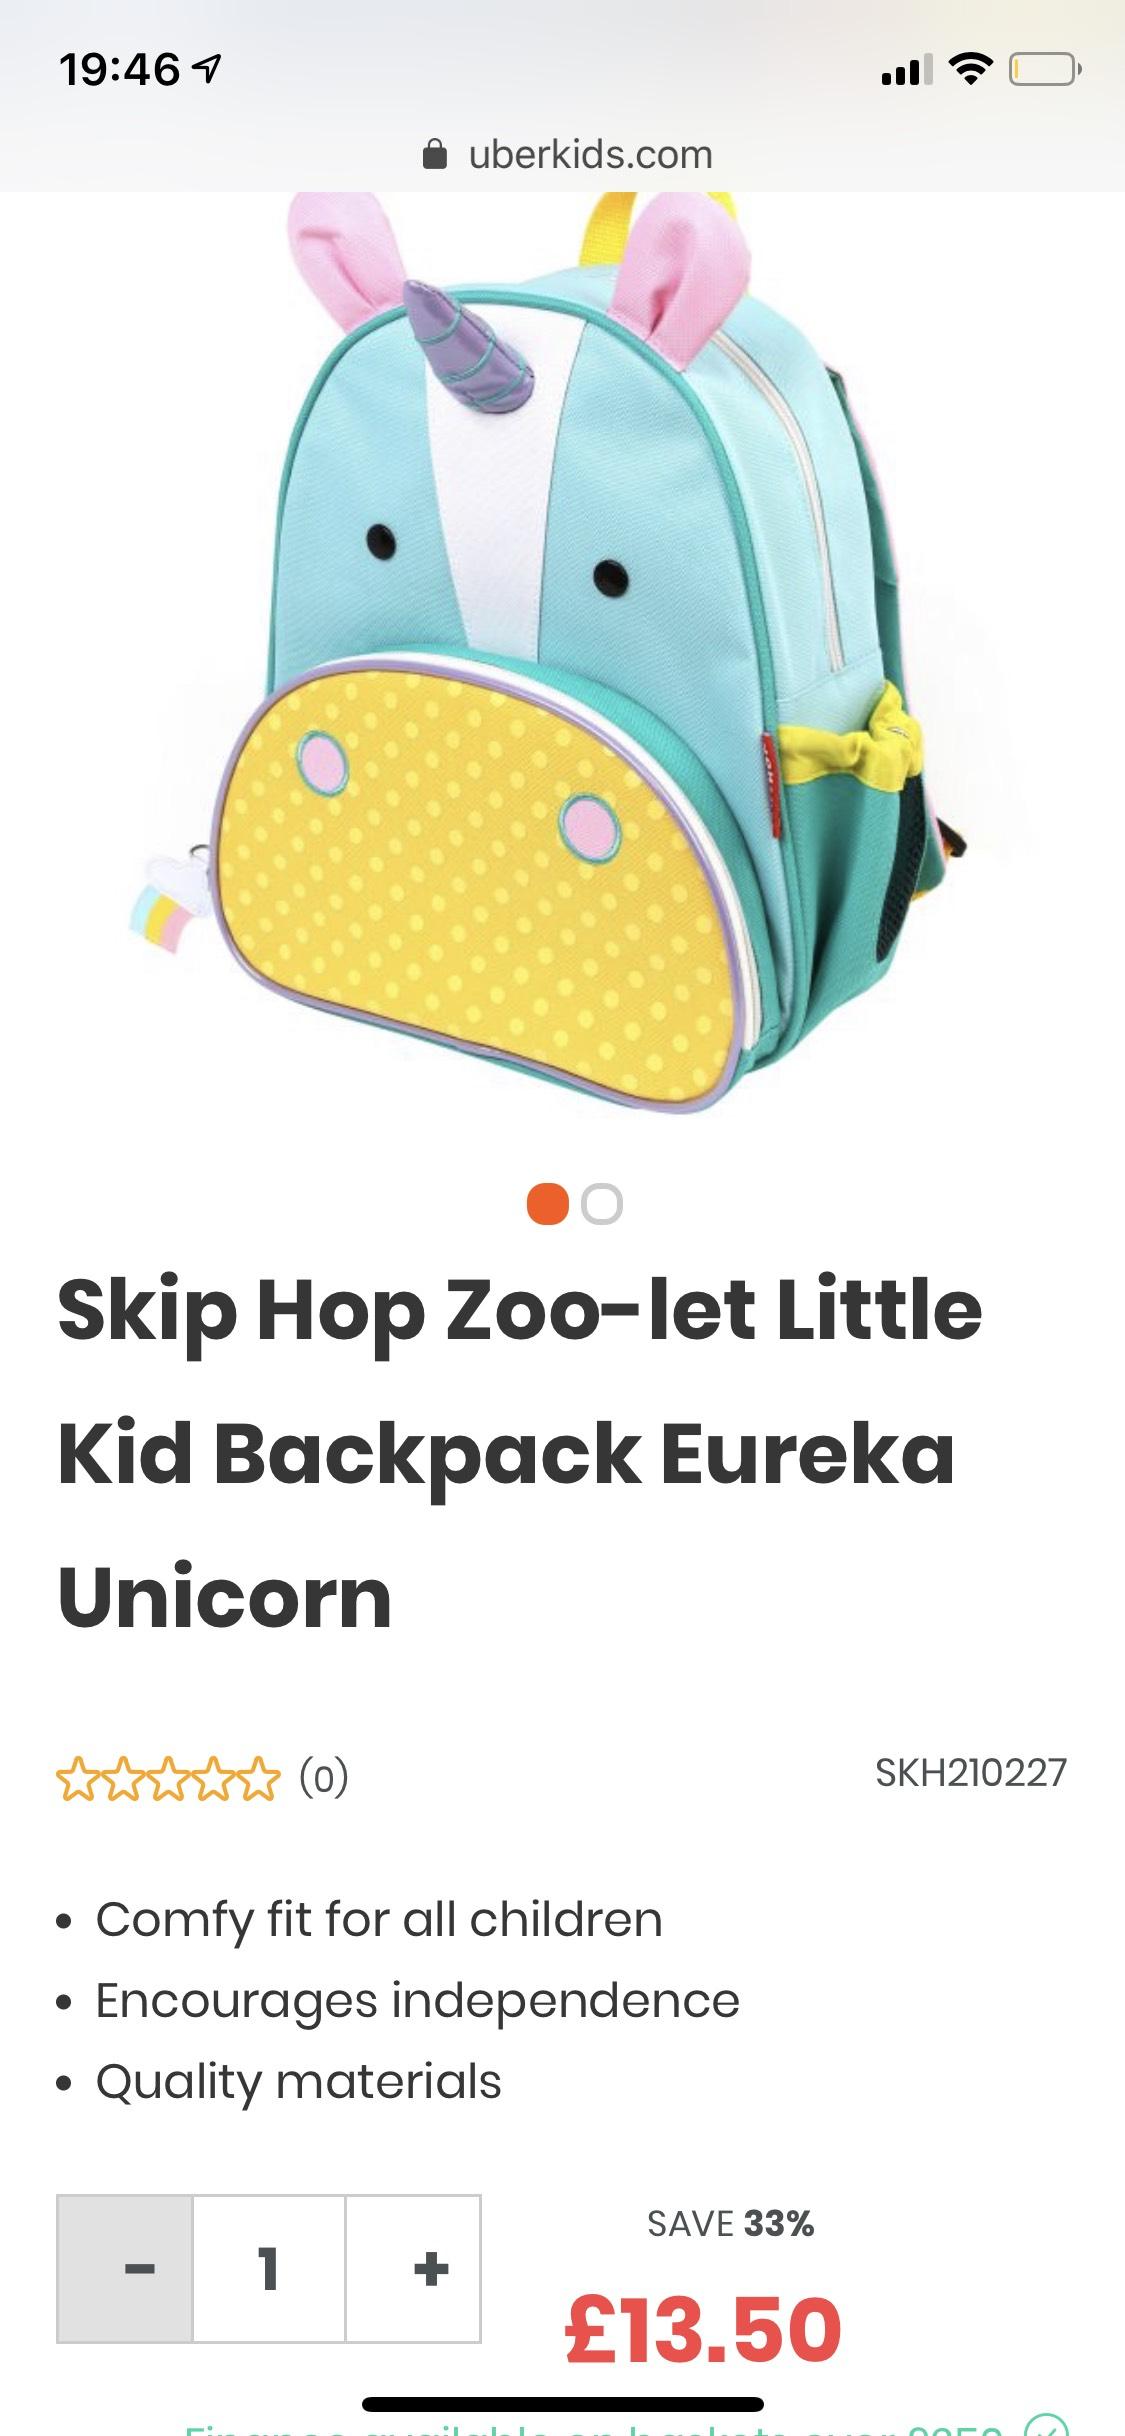 Skip Hop Zoo-let Little Kid Backpack Eureka Unicorn £13.50 @ Uber Kids